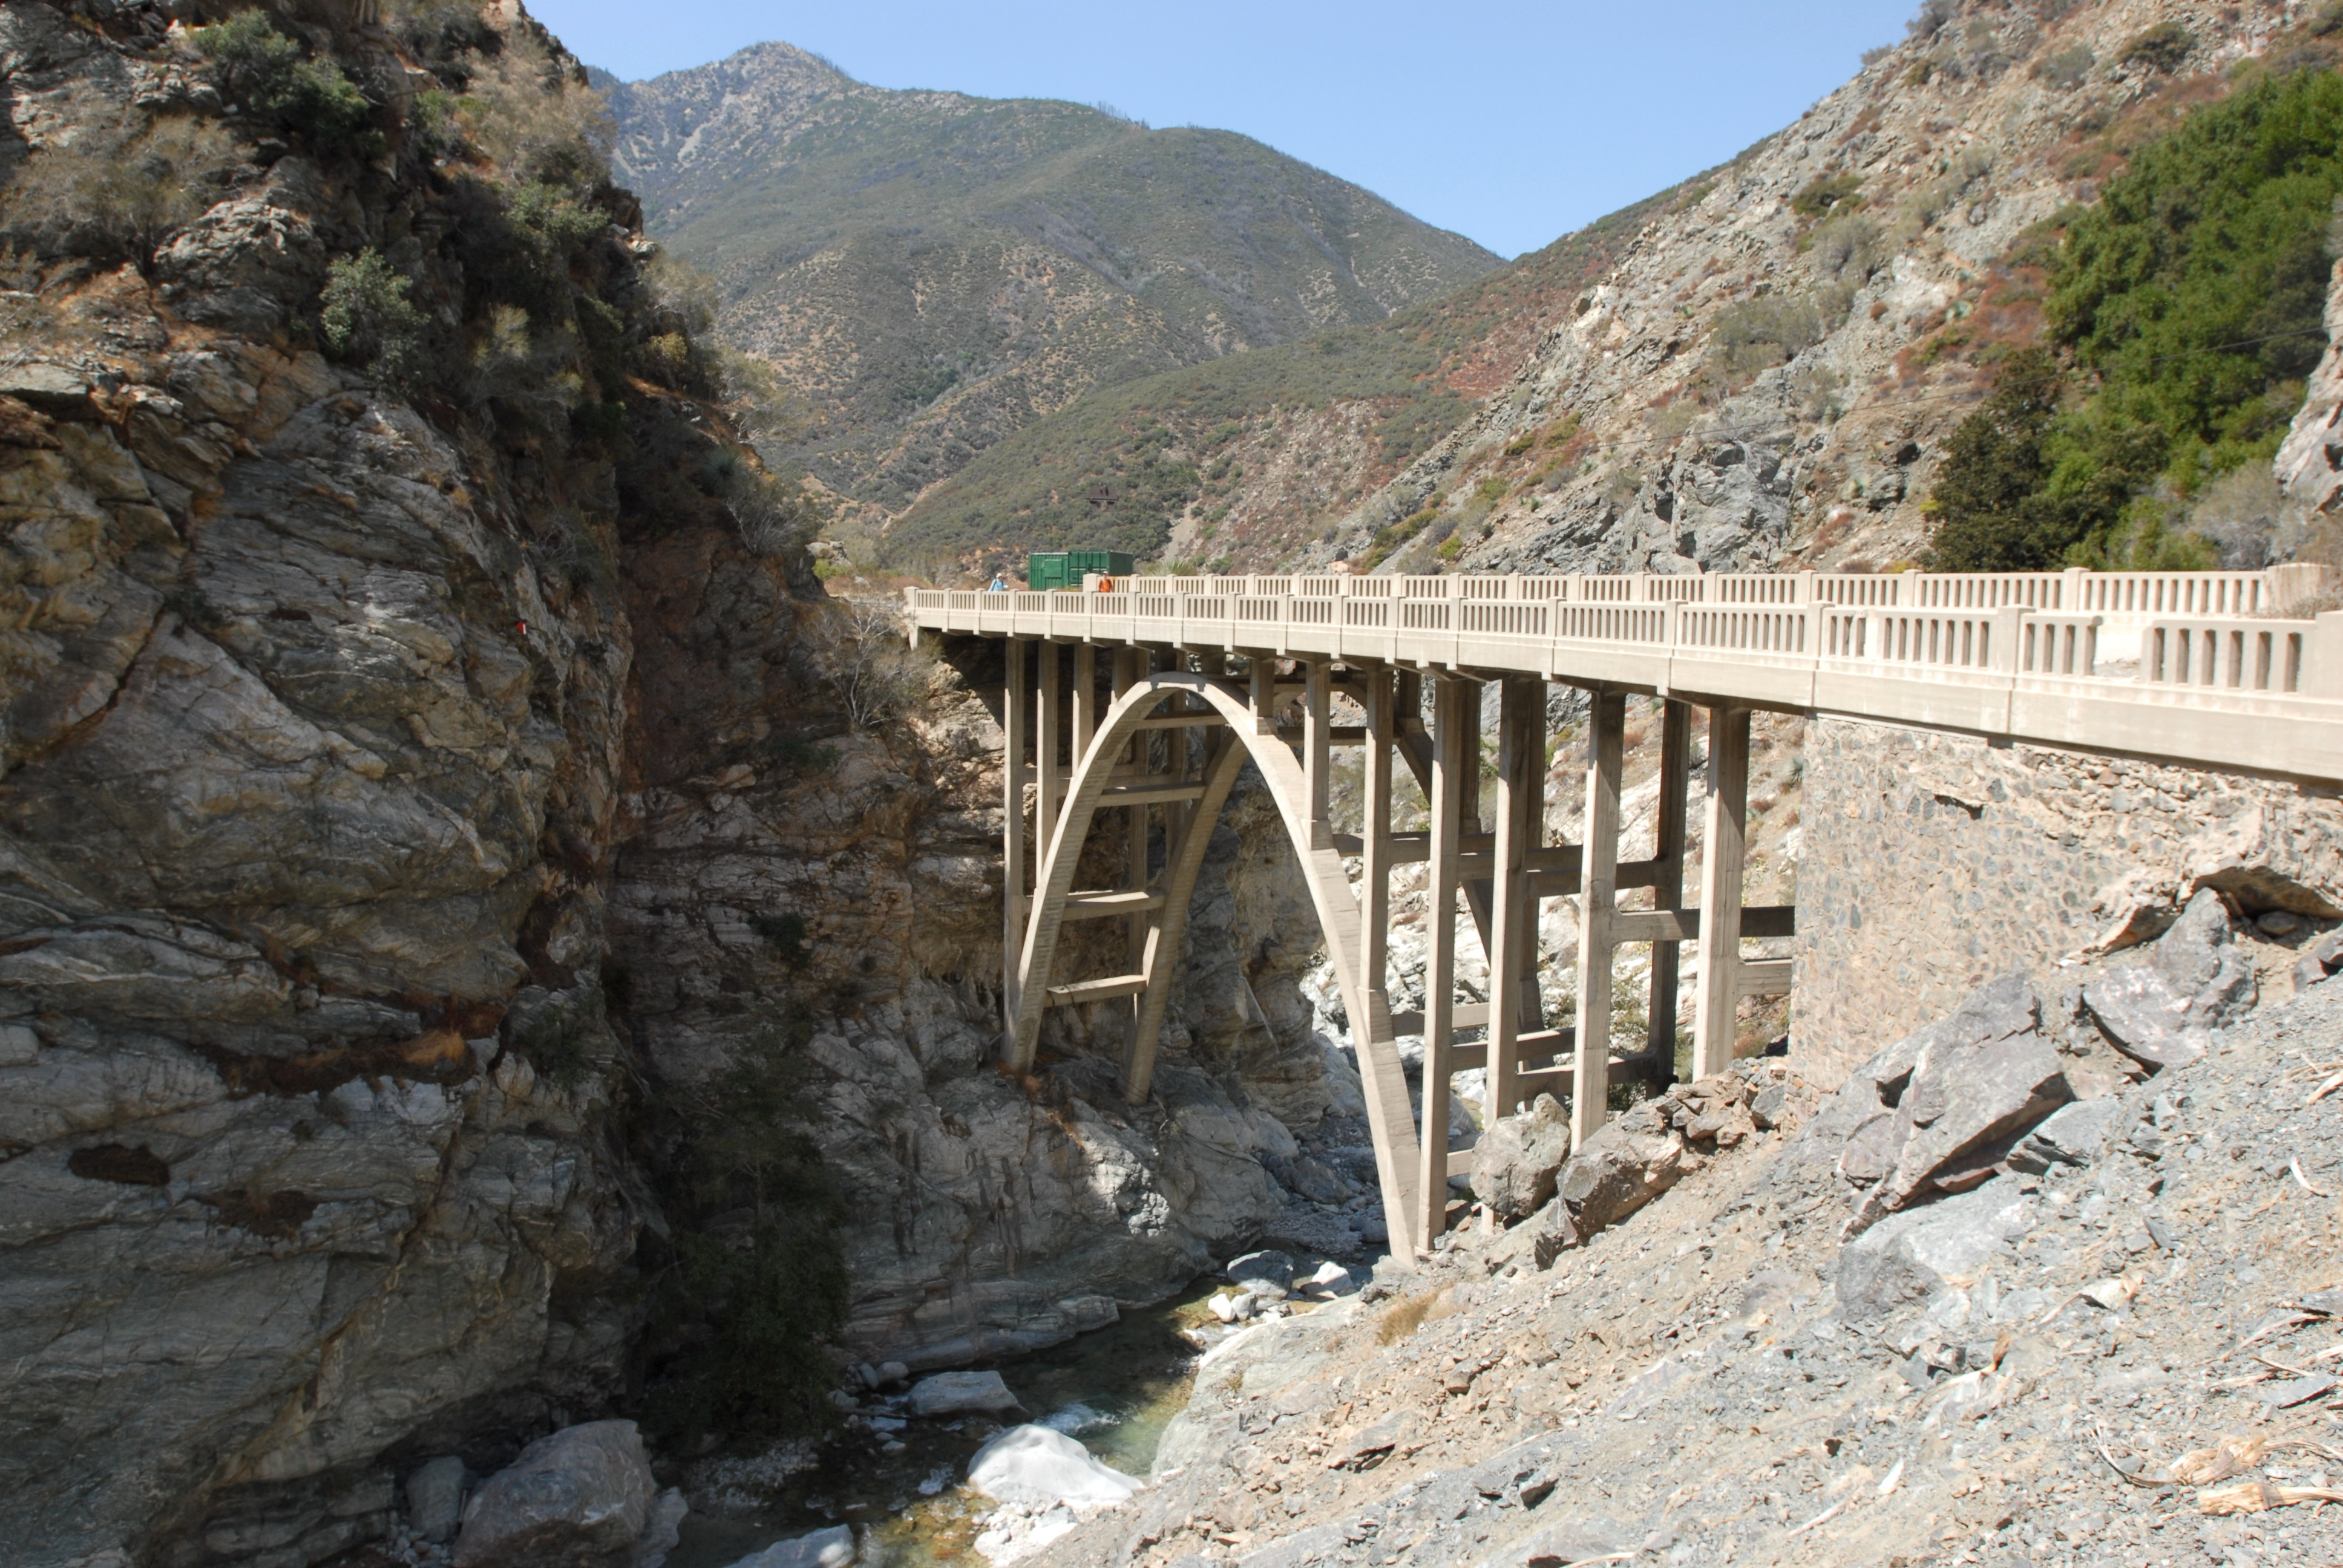 FileThe Bridge to Nowhere San Gabriel Mountains.jpg   Wikimedia ...